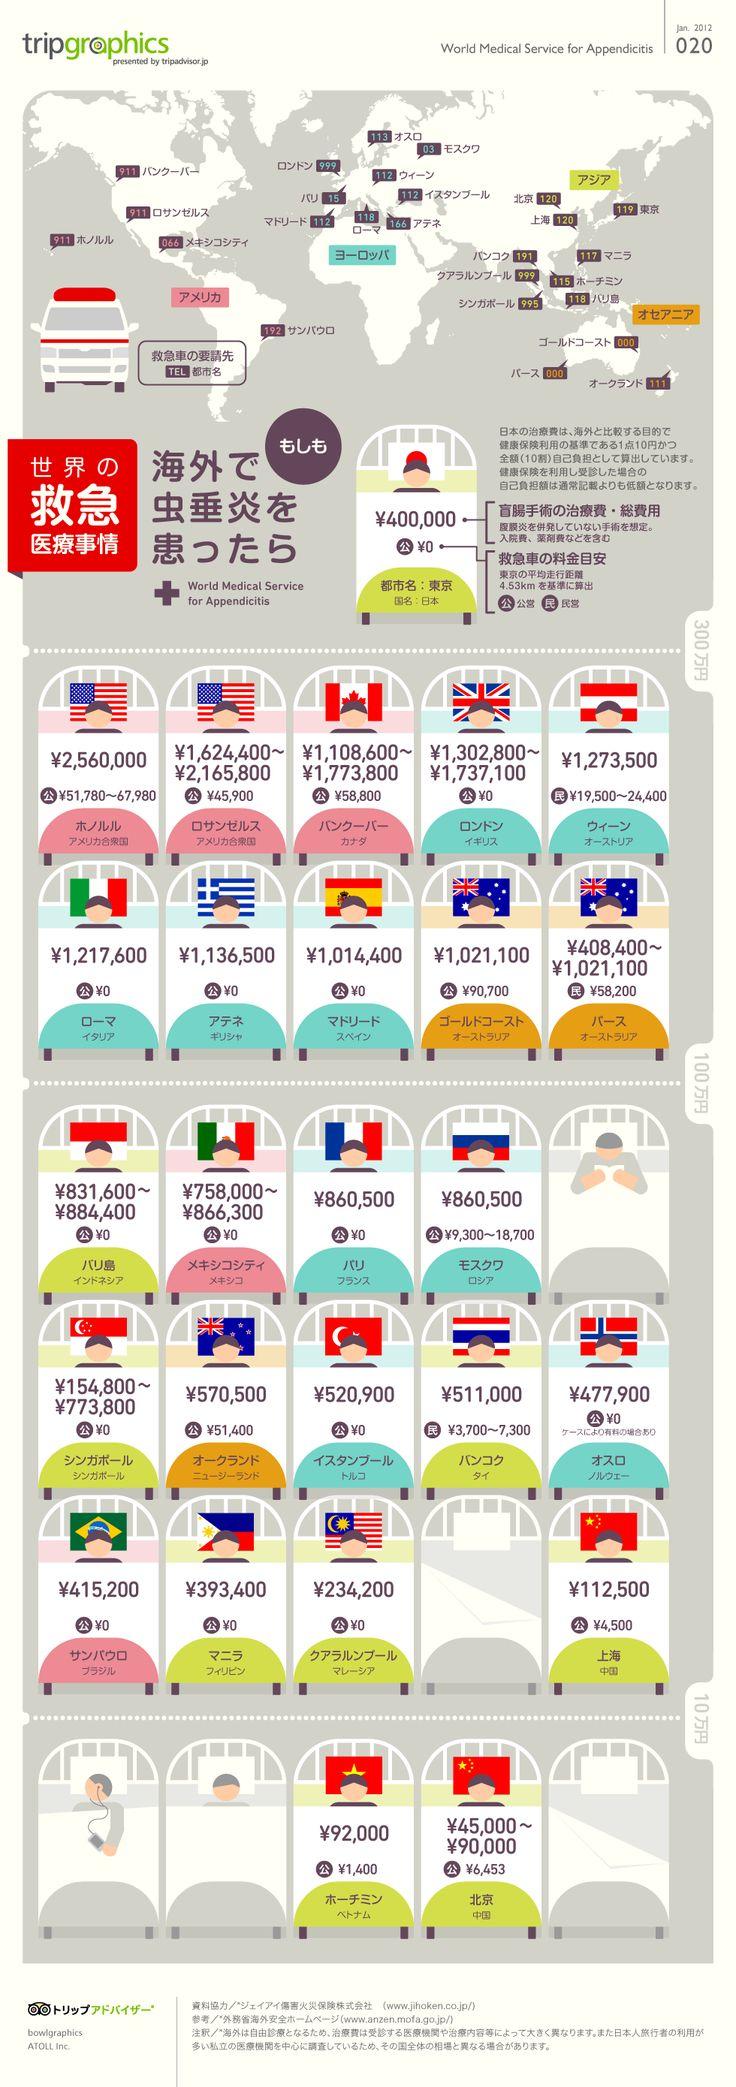 Emergency Medical Costs Around the World, via TripAdvisor | 世界の救急医療事情 トリップアドバイザーのインフォグラフィックスで世界の旅が見える